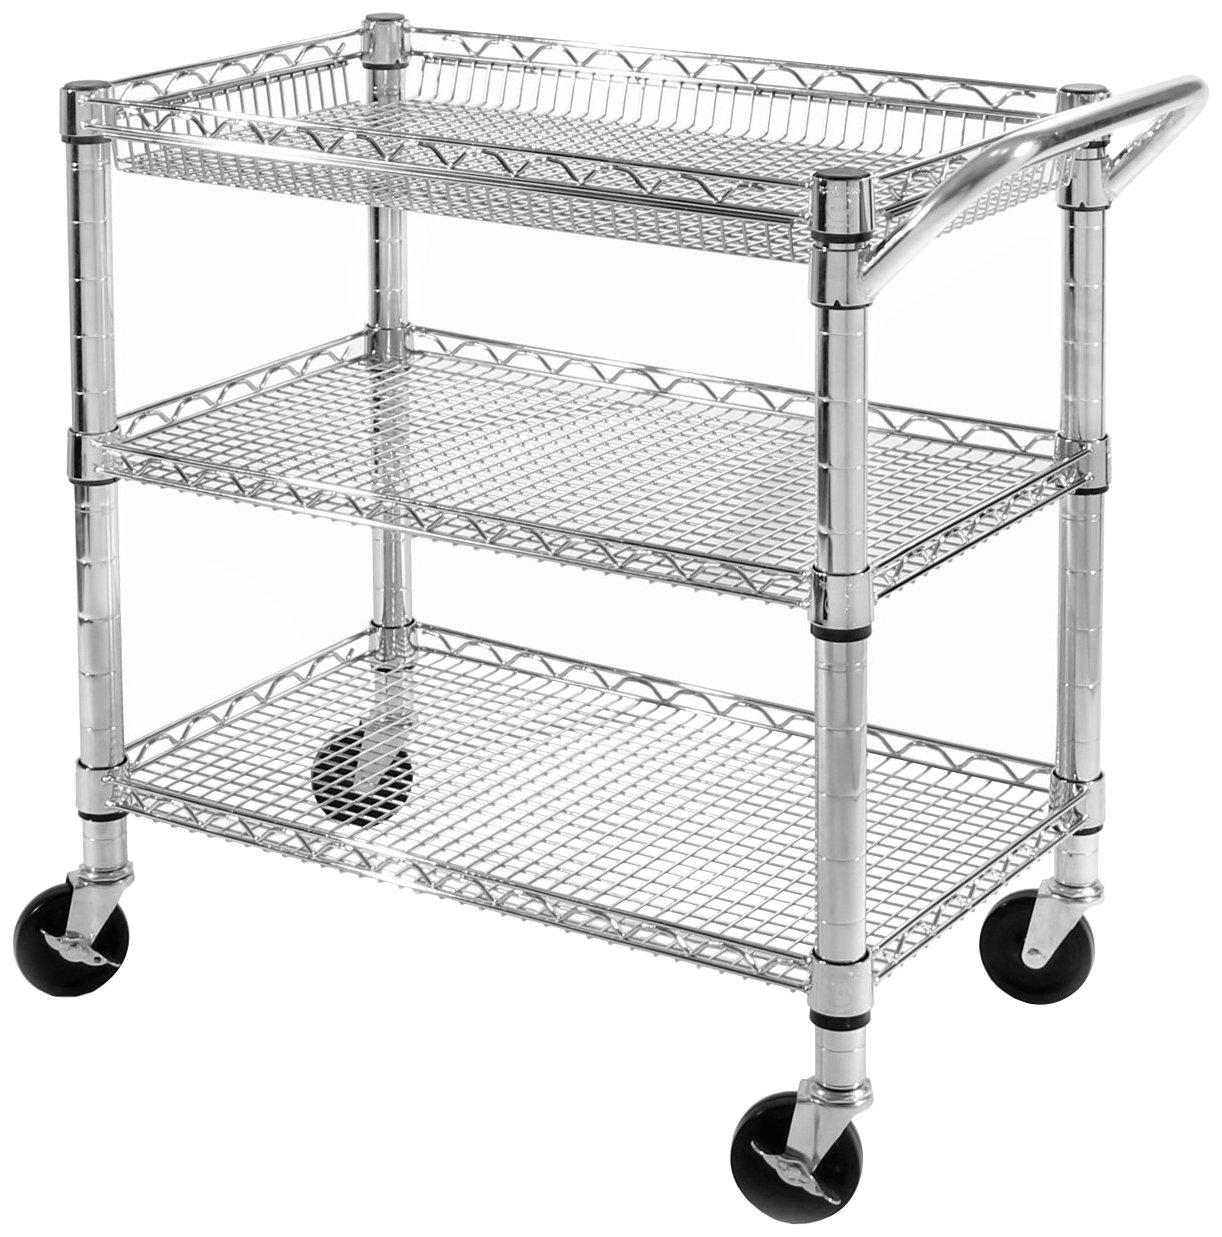 Seville Classics 3-Shelf Heavy-Duty Commercial Utility Cart - UltraZinc